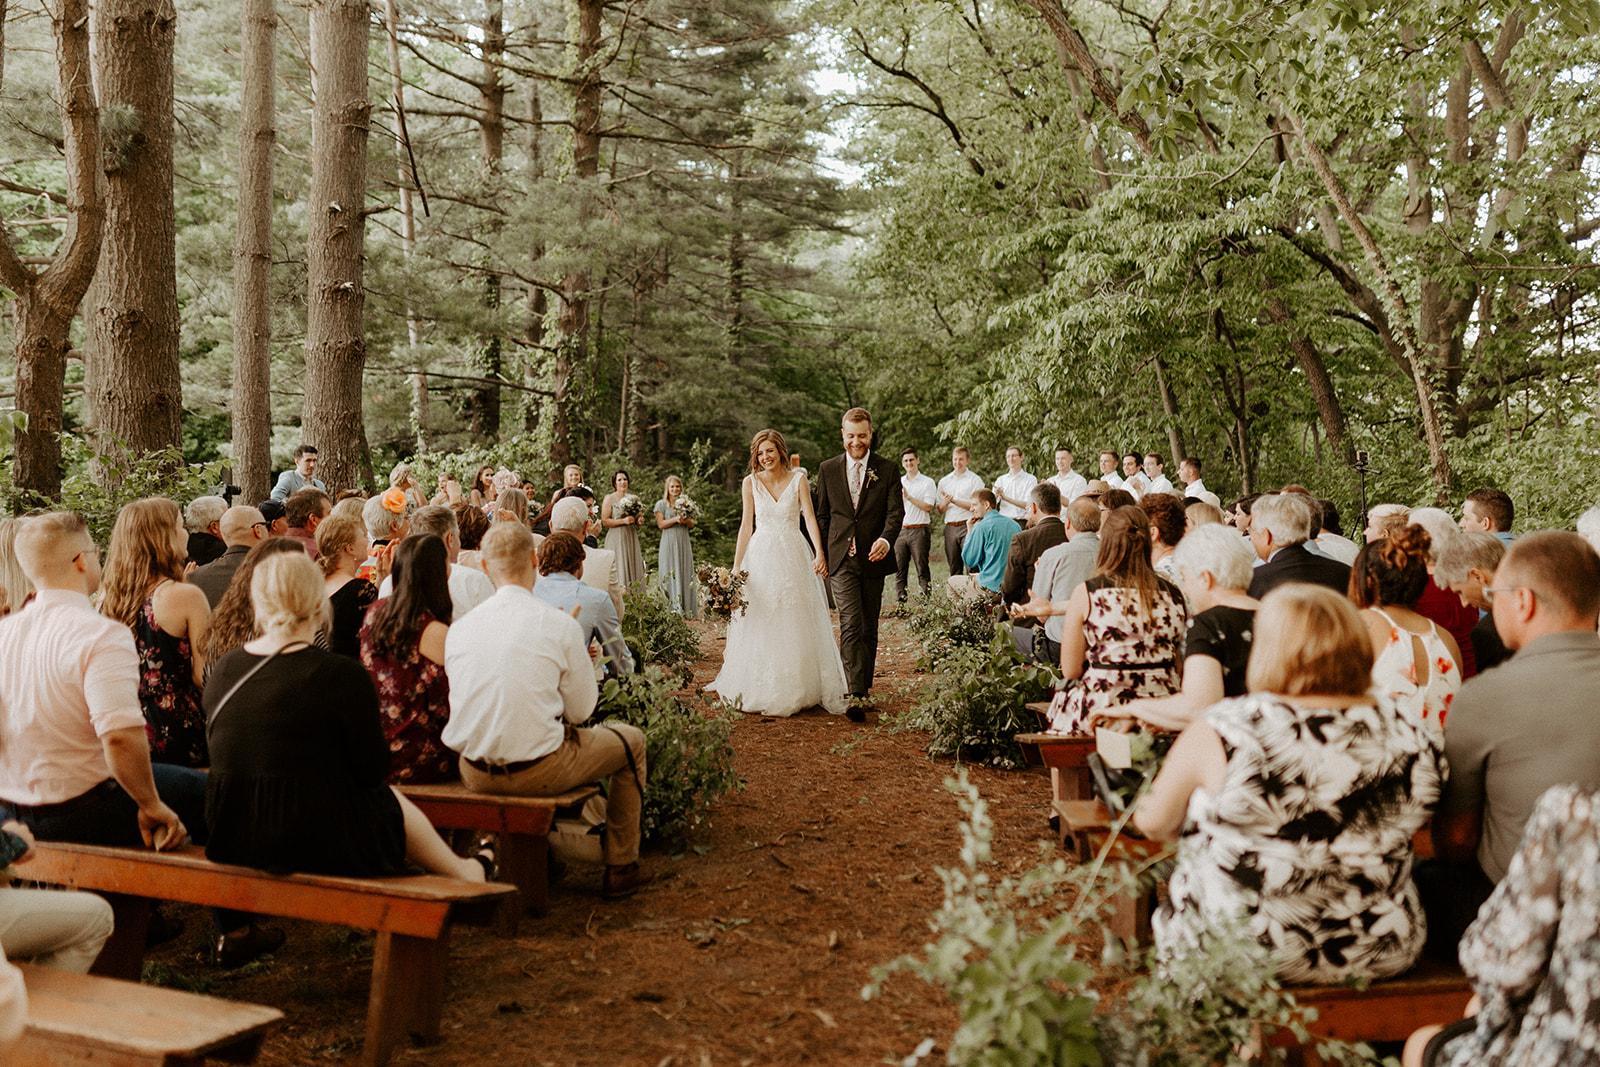 camp_wokanda_peoria_illinois_wedding_photographer_wright_photographs_bliese_0282.jpg